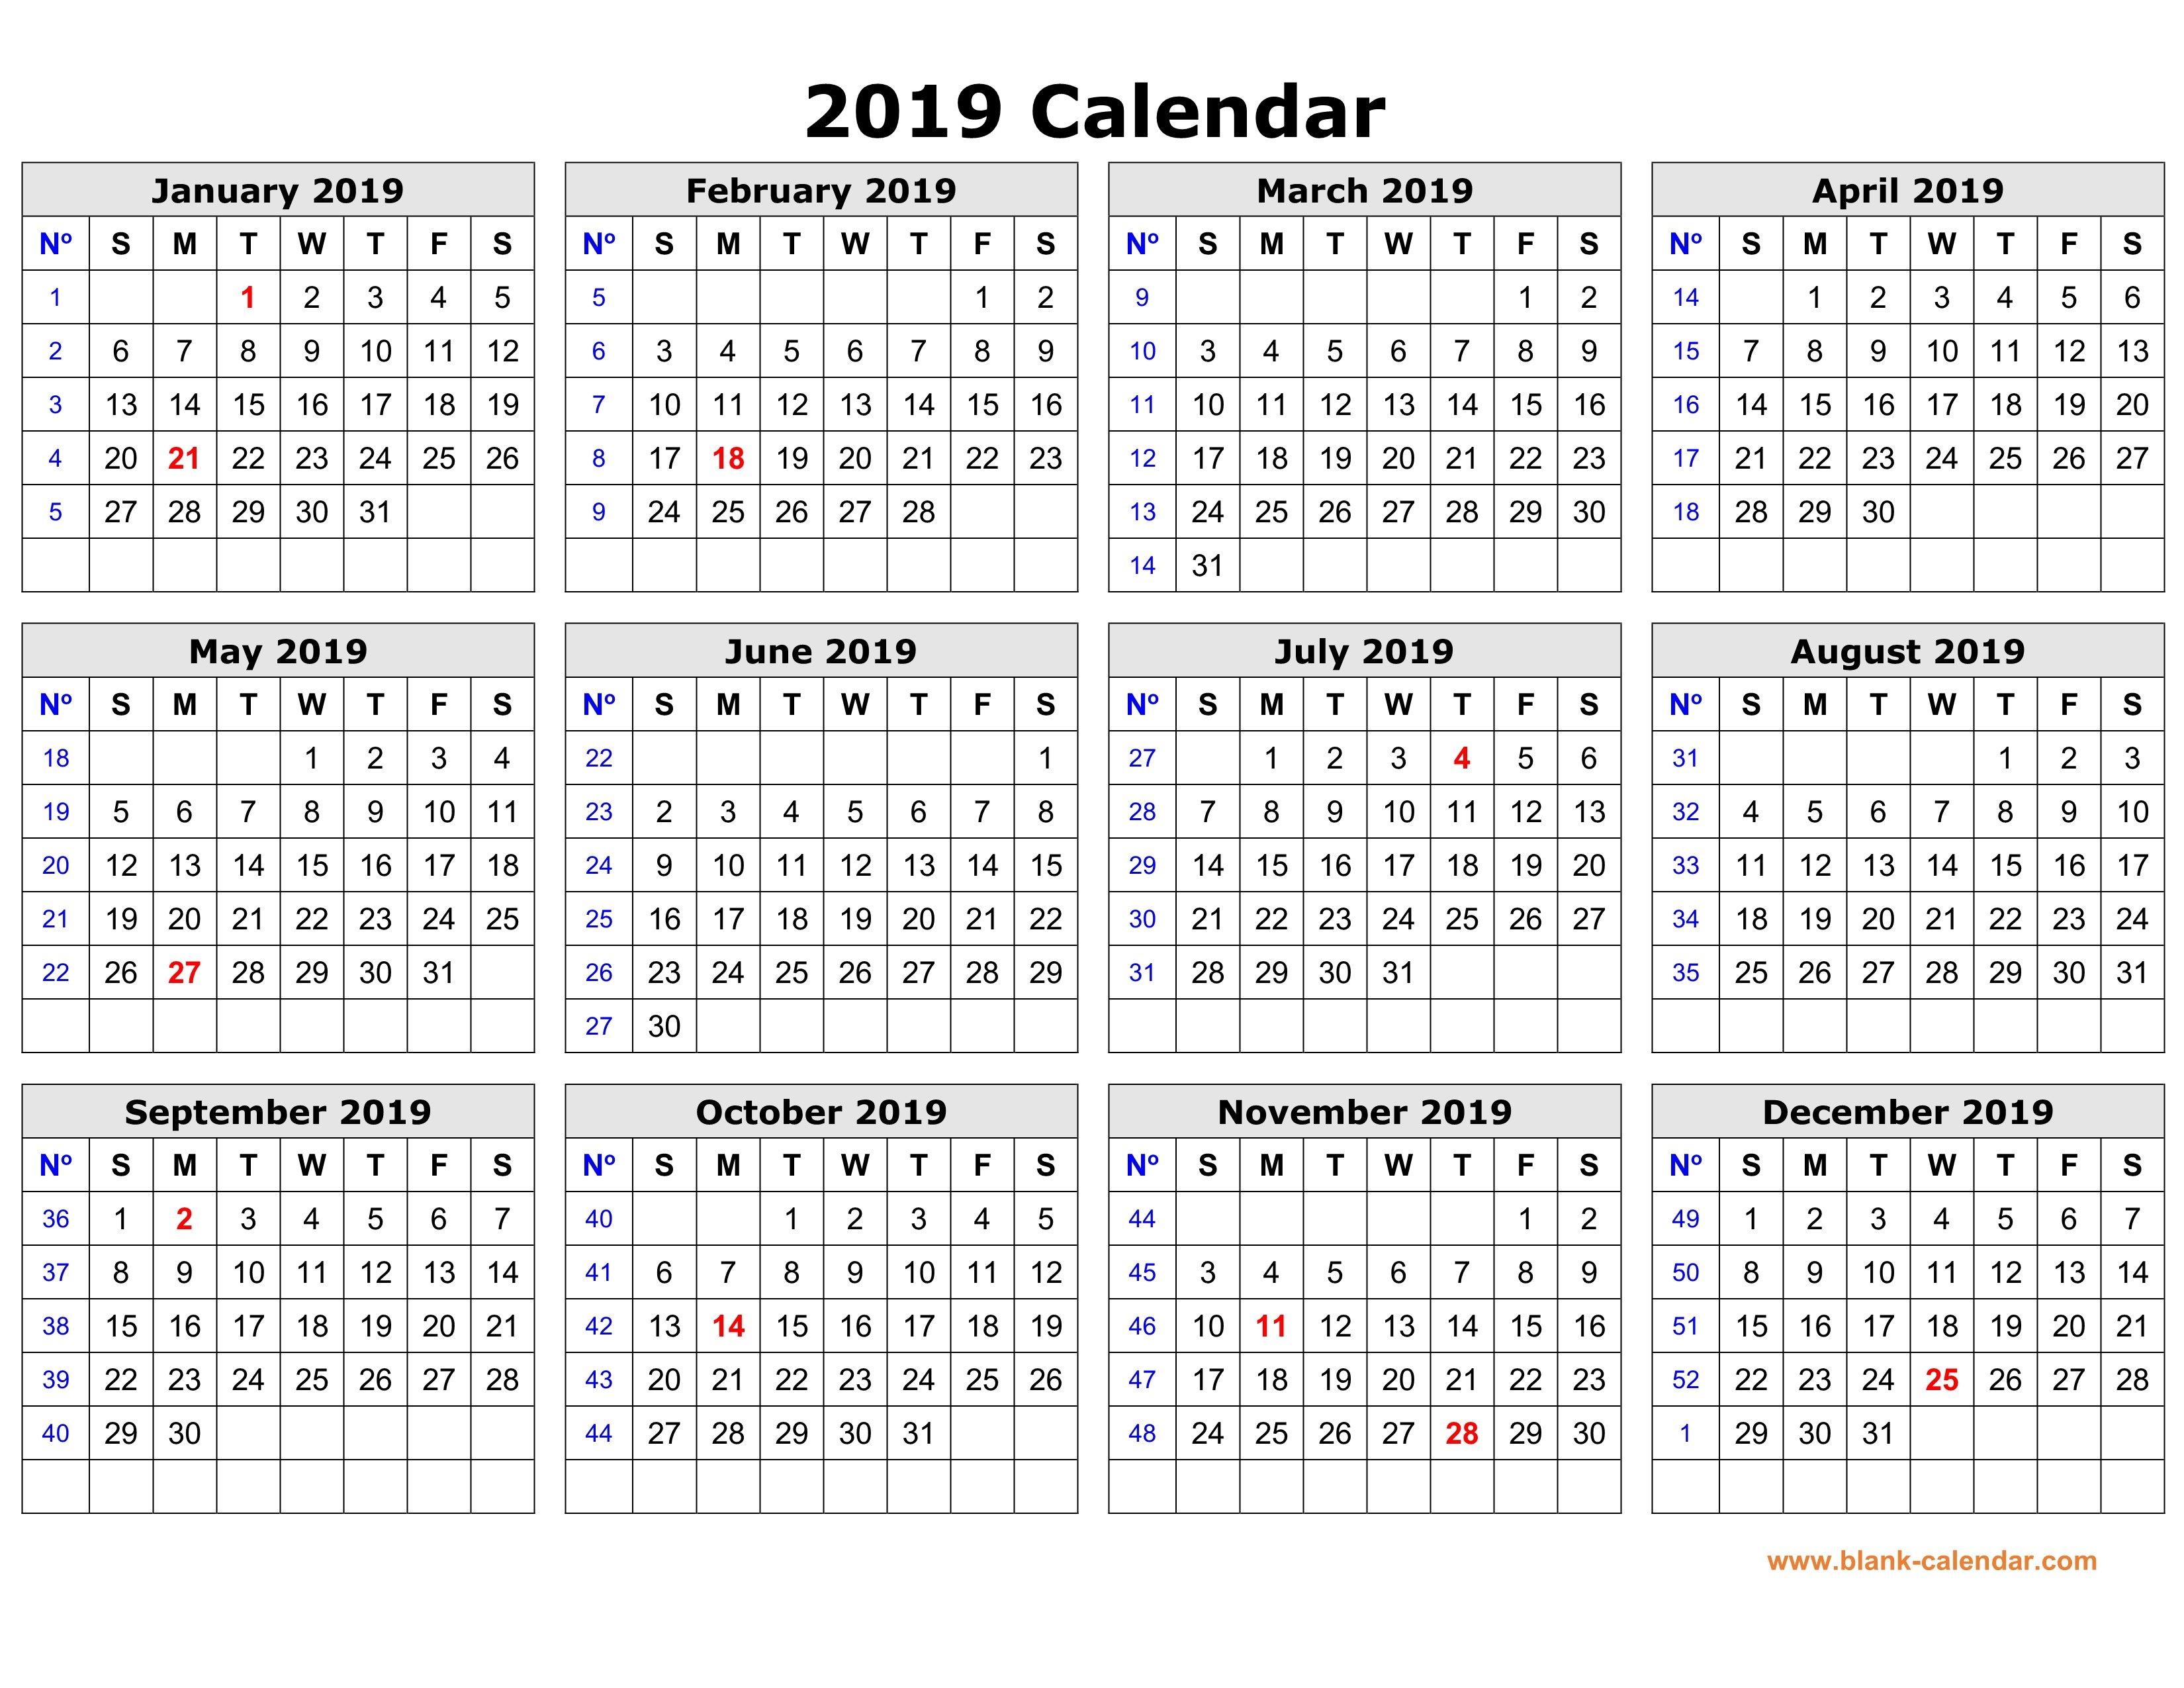 Free Download Printable Calendar 2019 In One Page, Clean Design. Calendar 2019 Printable